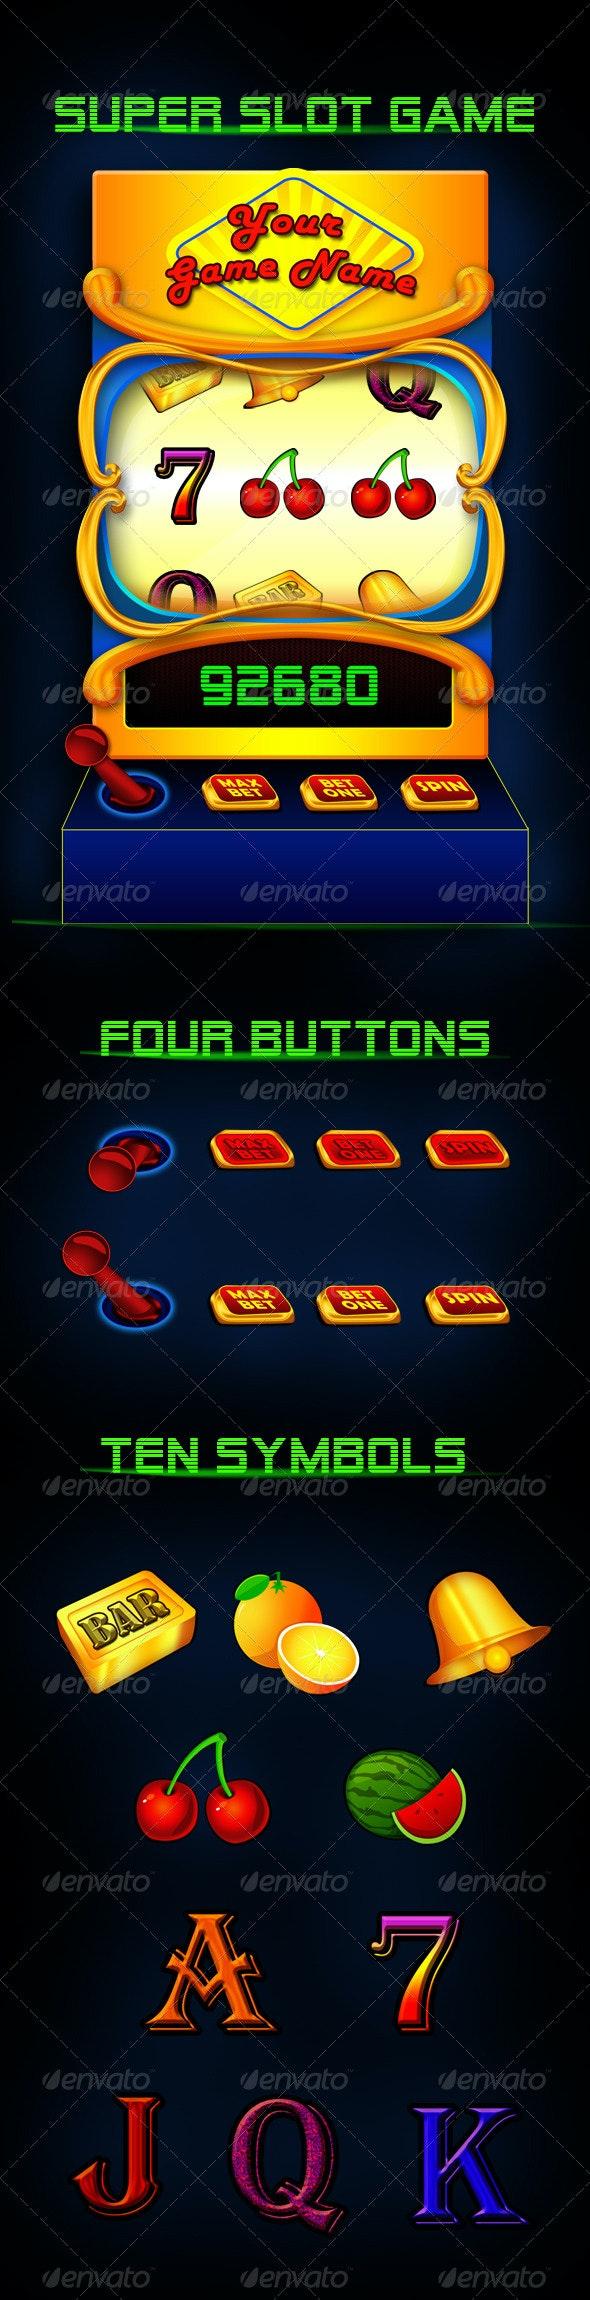 Super Slot Game Asset - Objects Illustrations